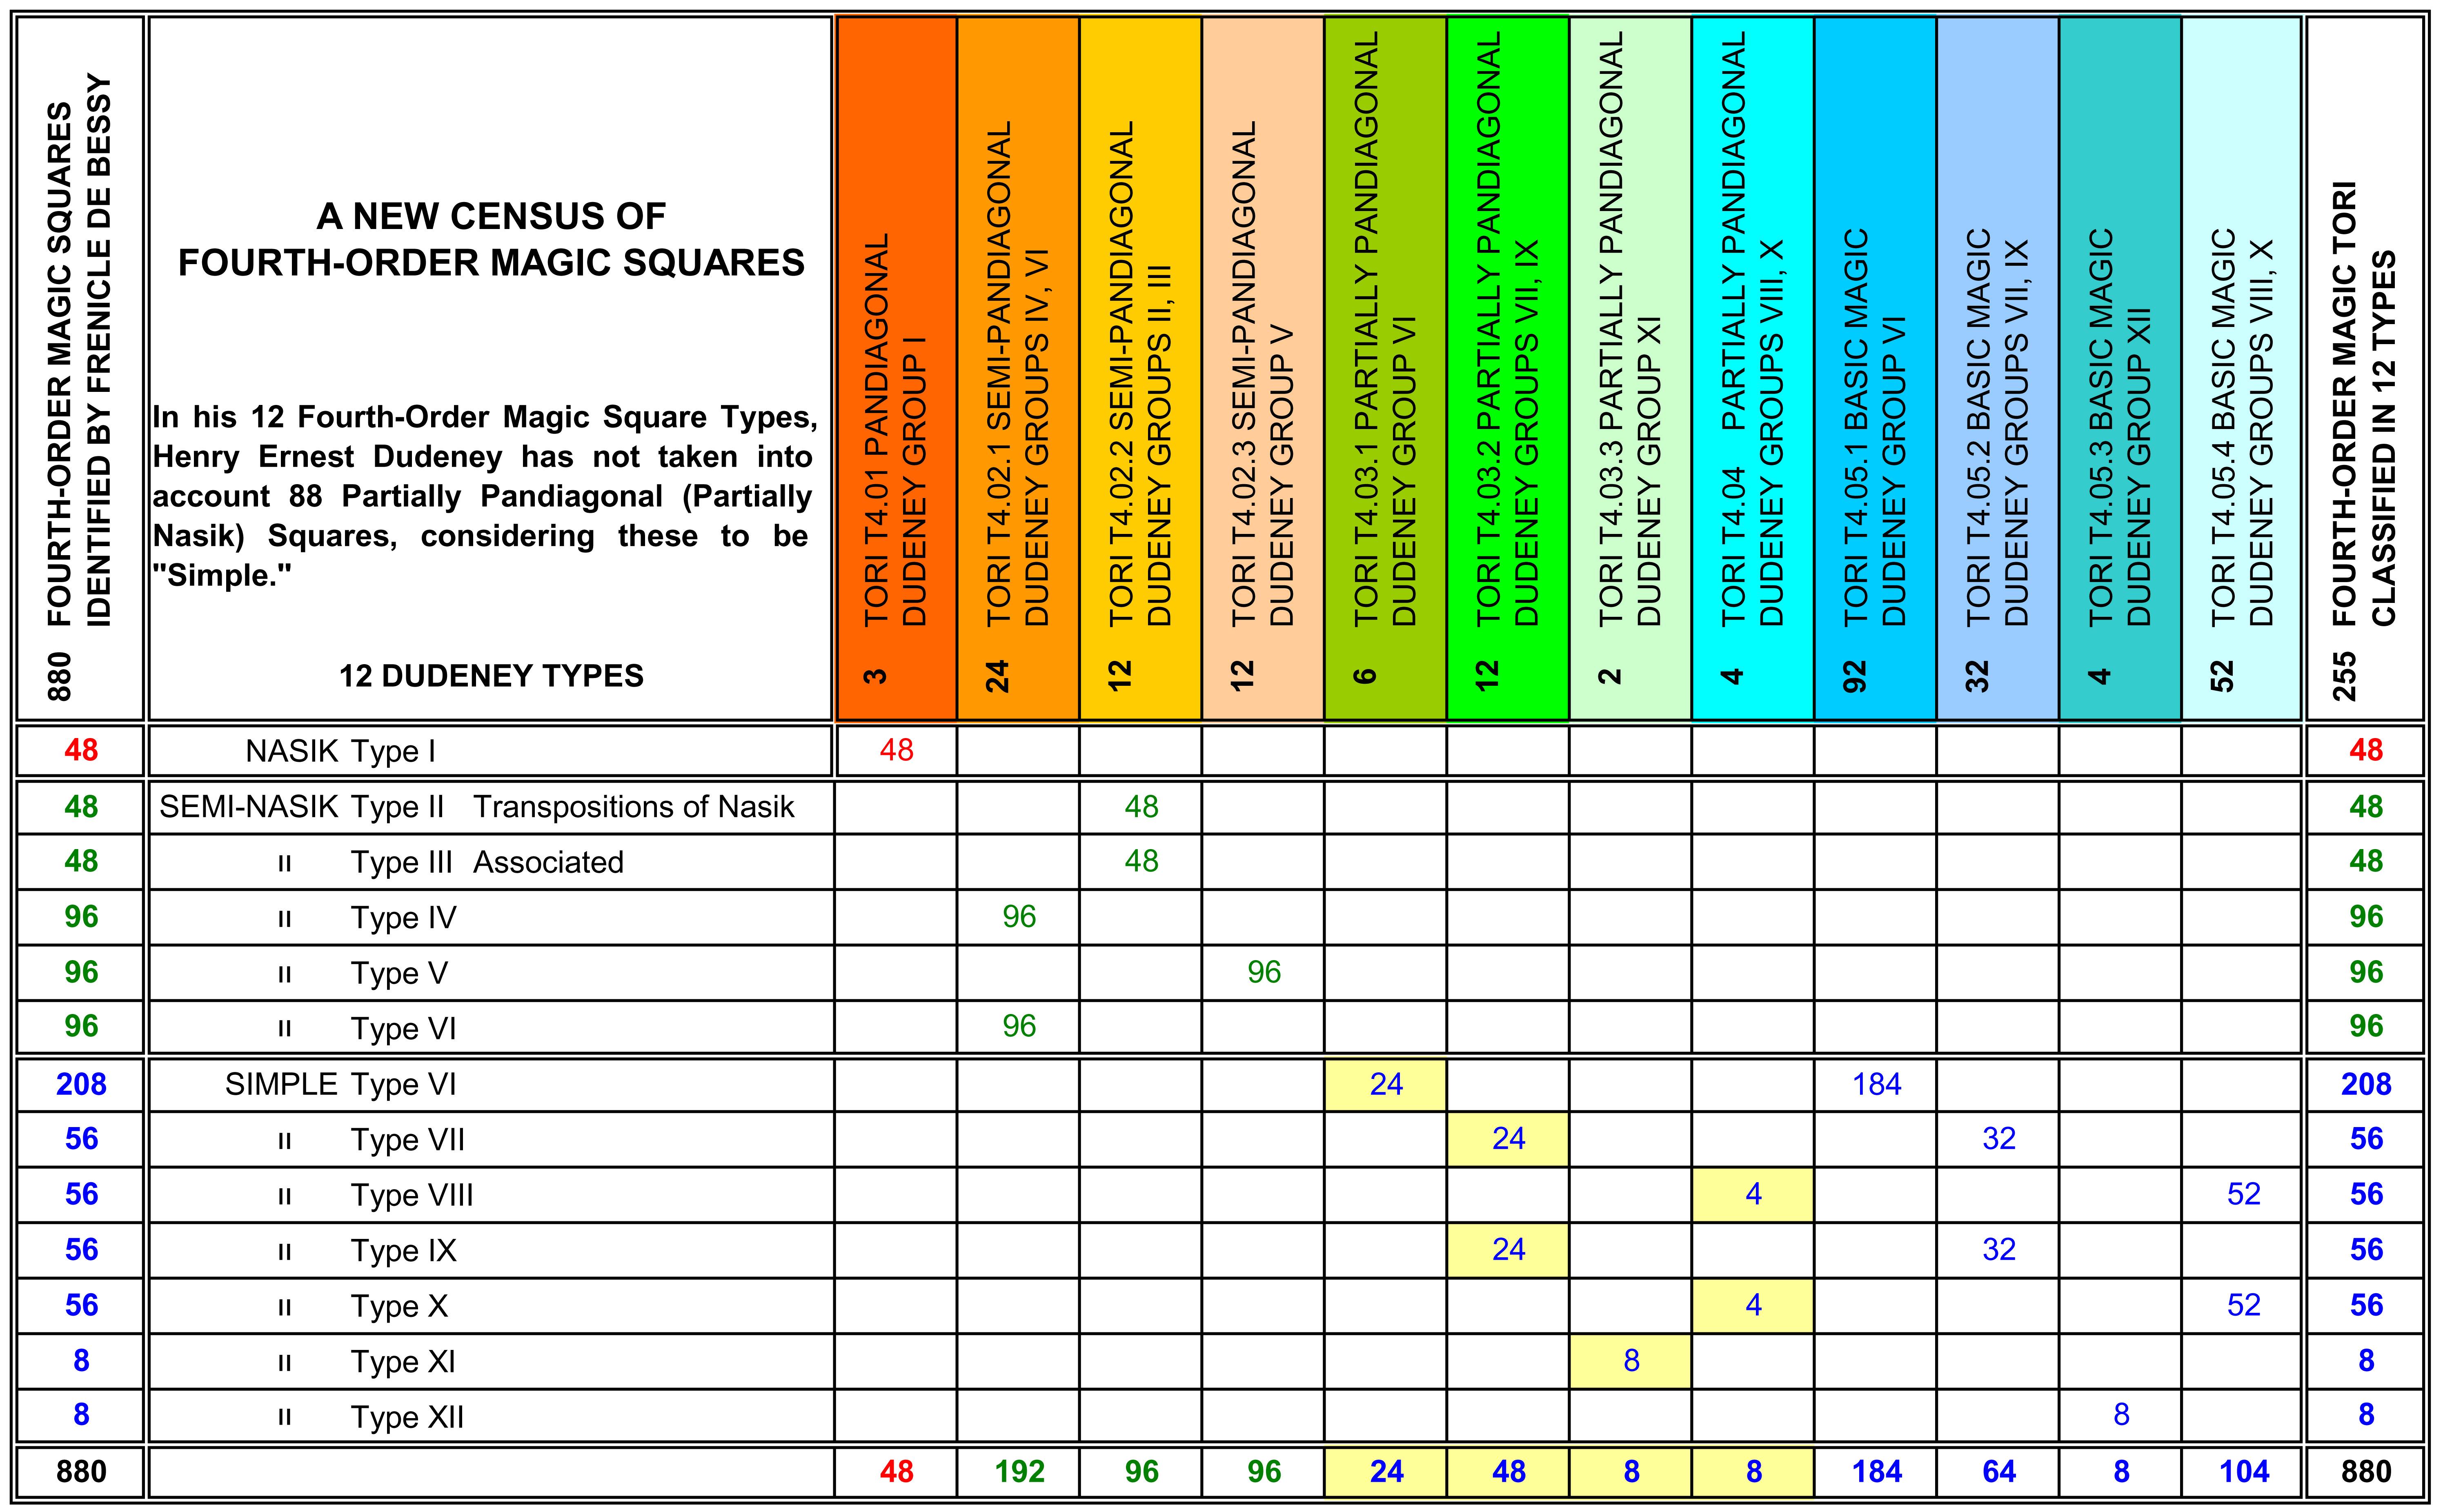 order 4 new census of 4th order magic squares